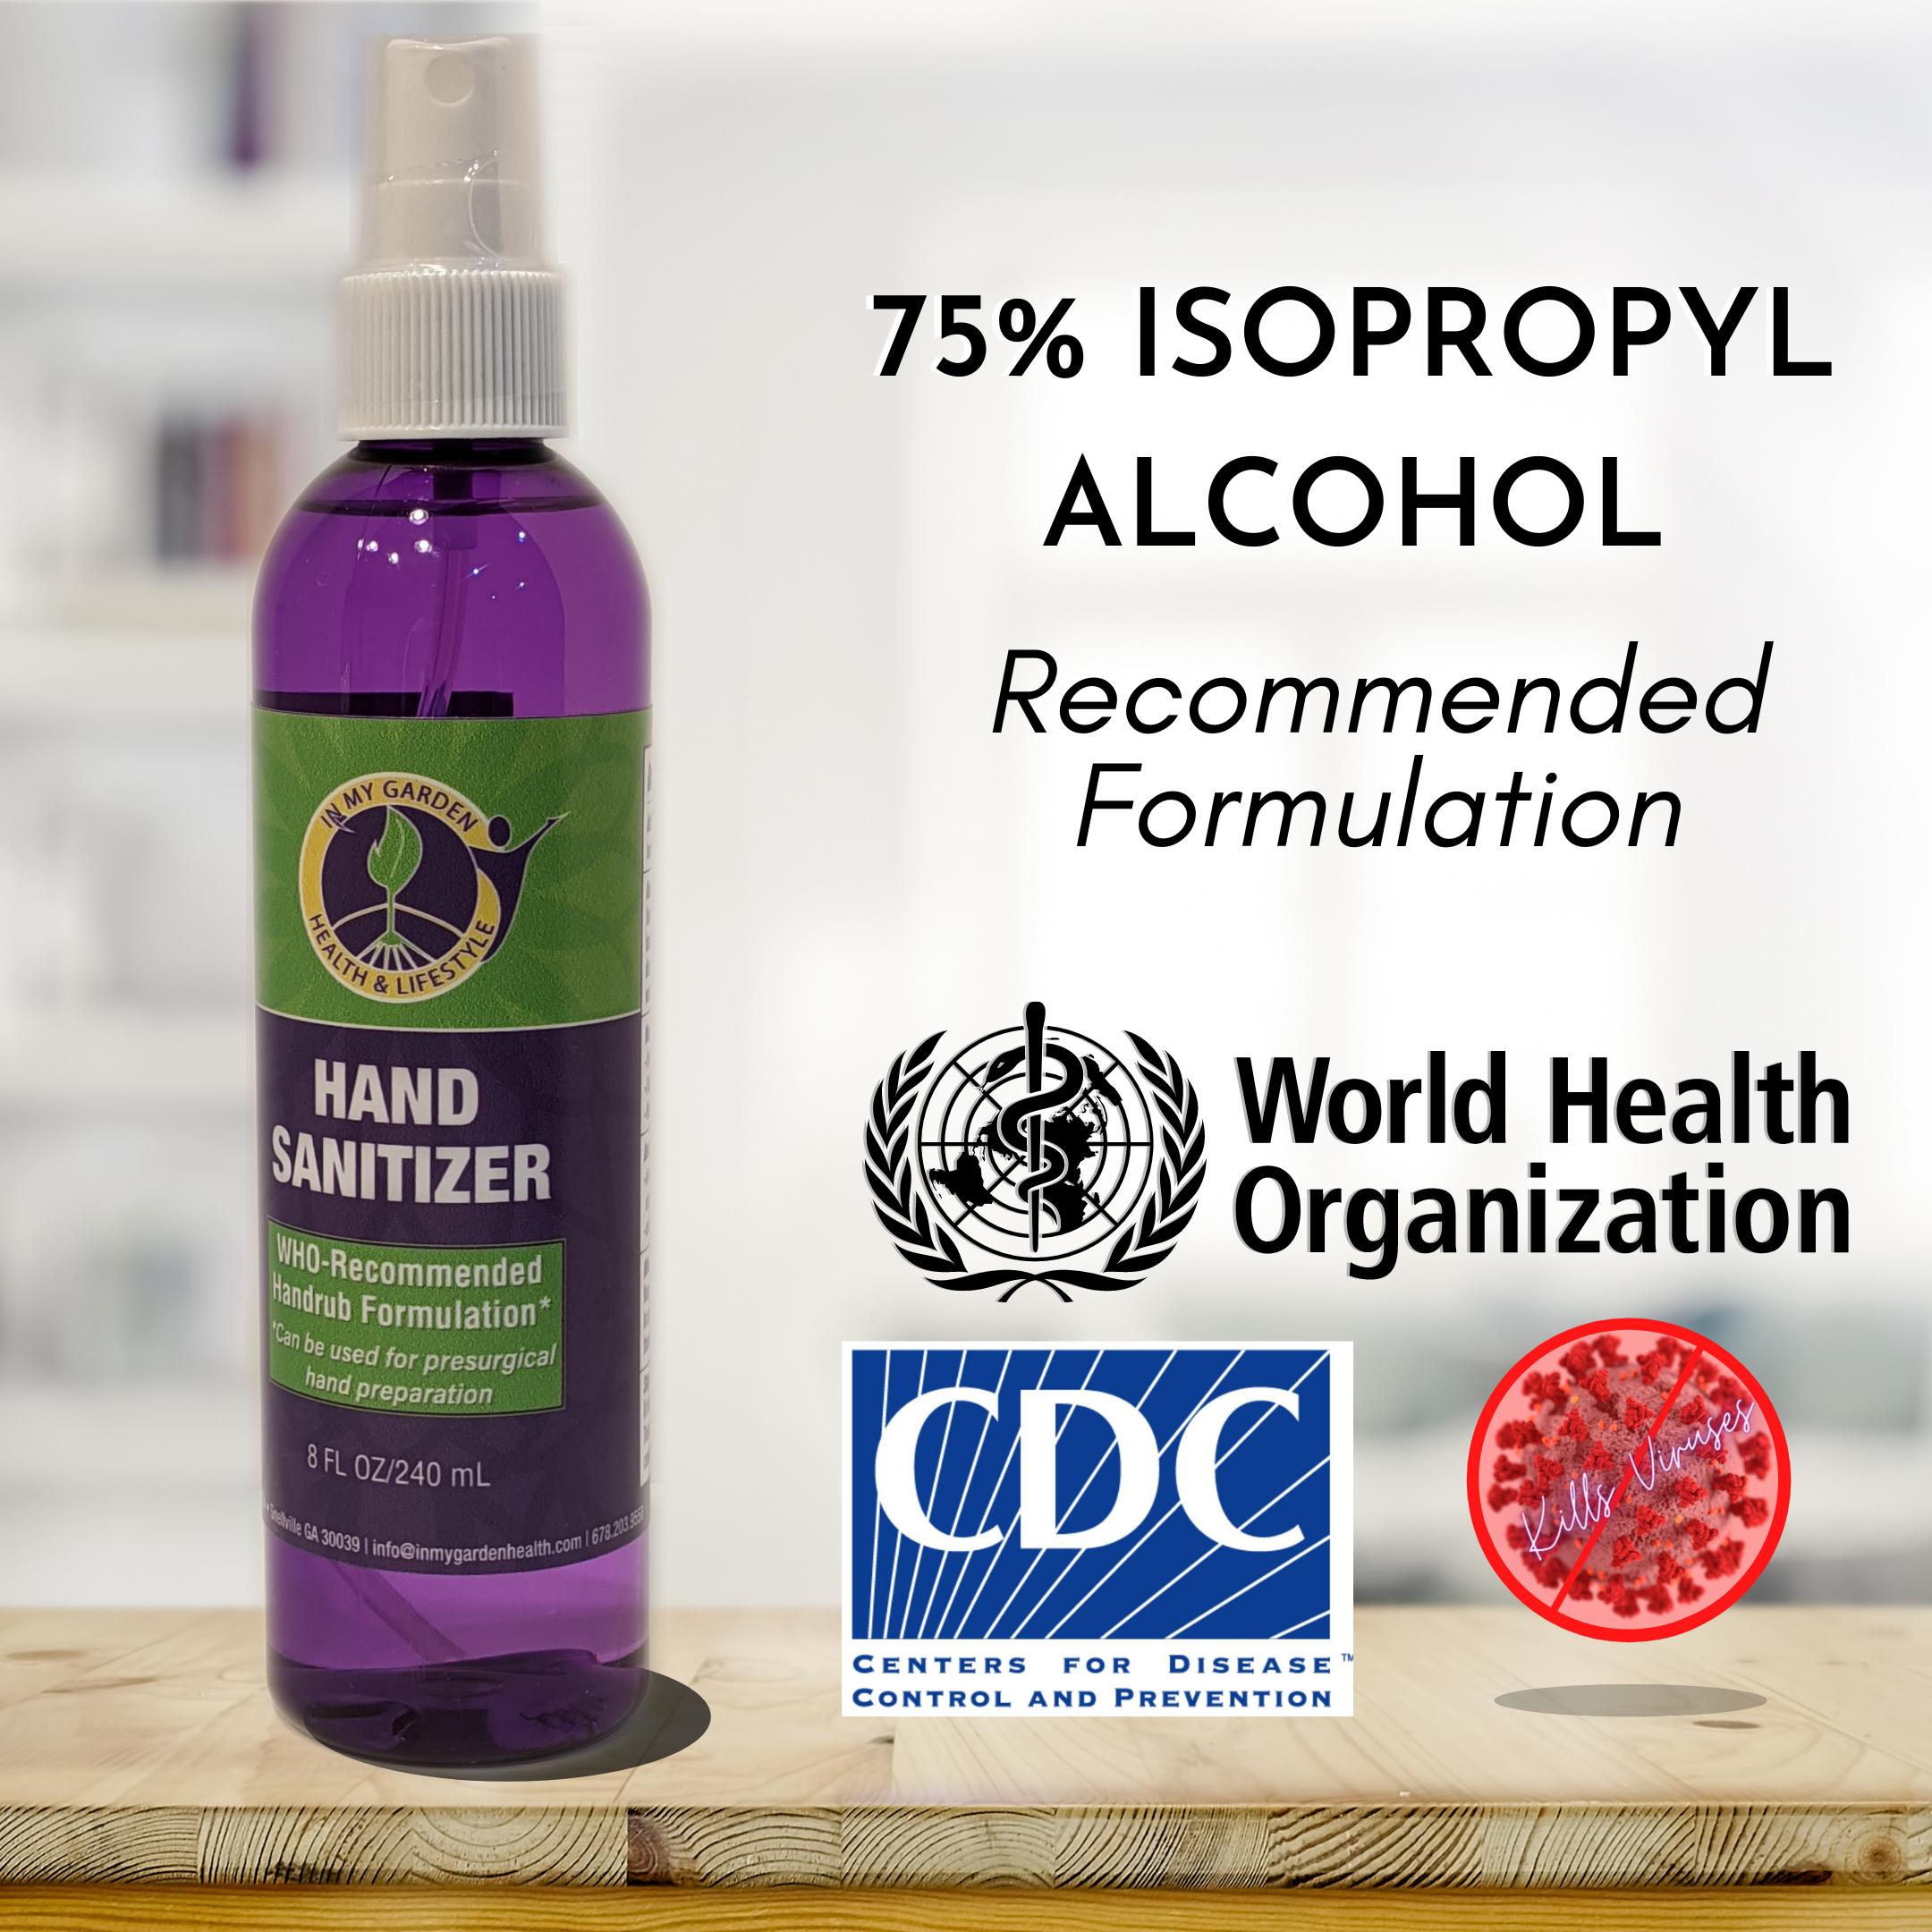 75% ISOPROPYL ALCOHOL (1)